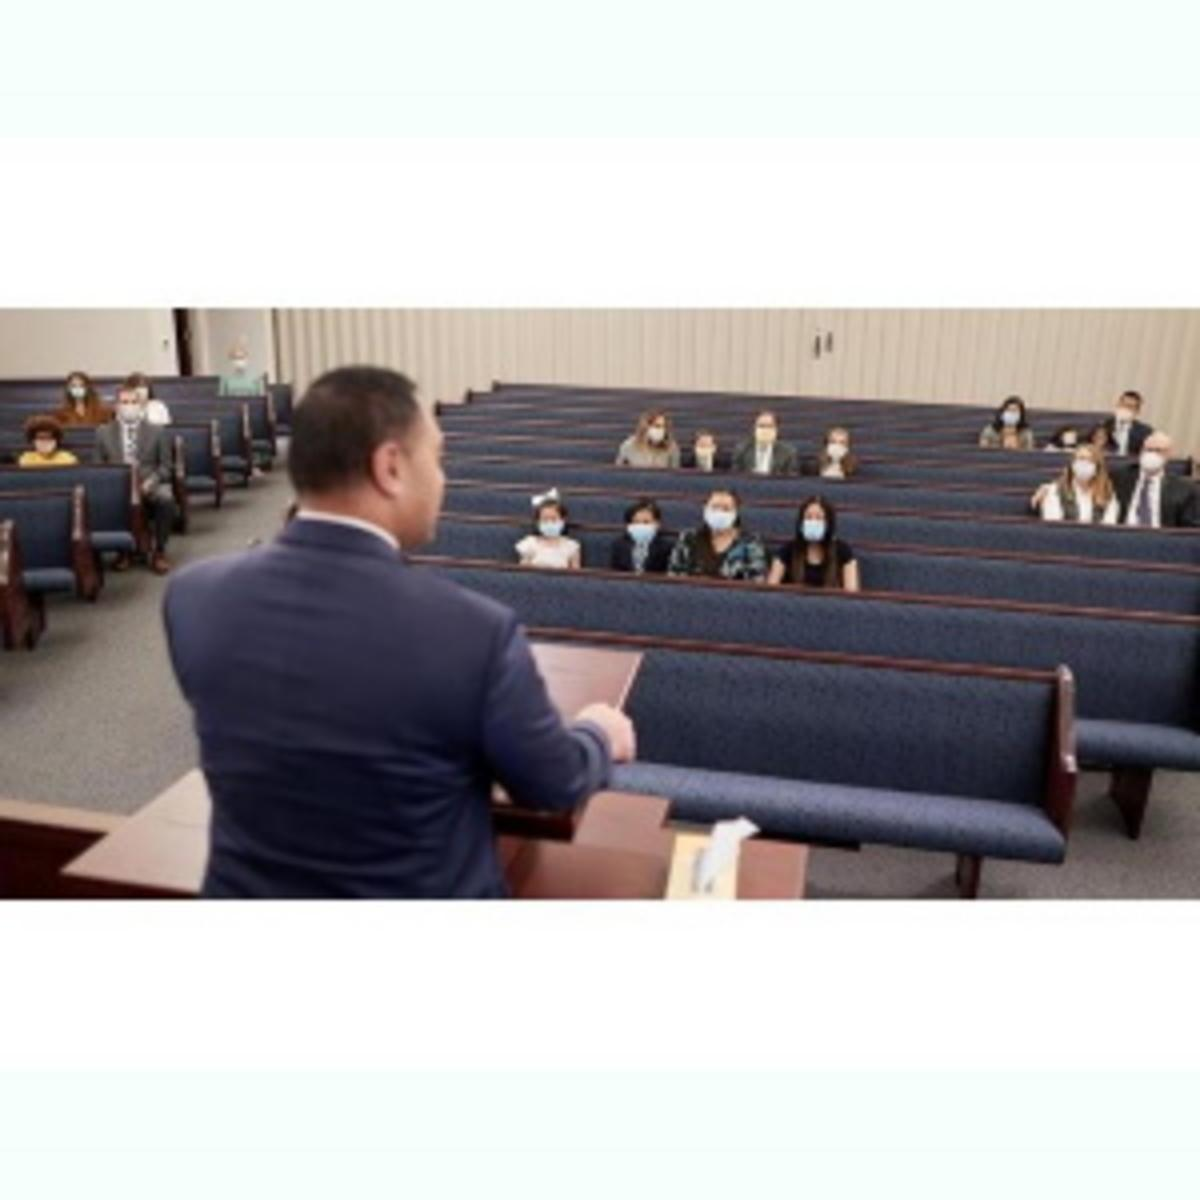 Church meetings